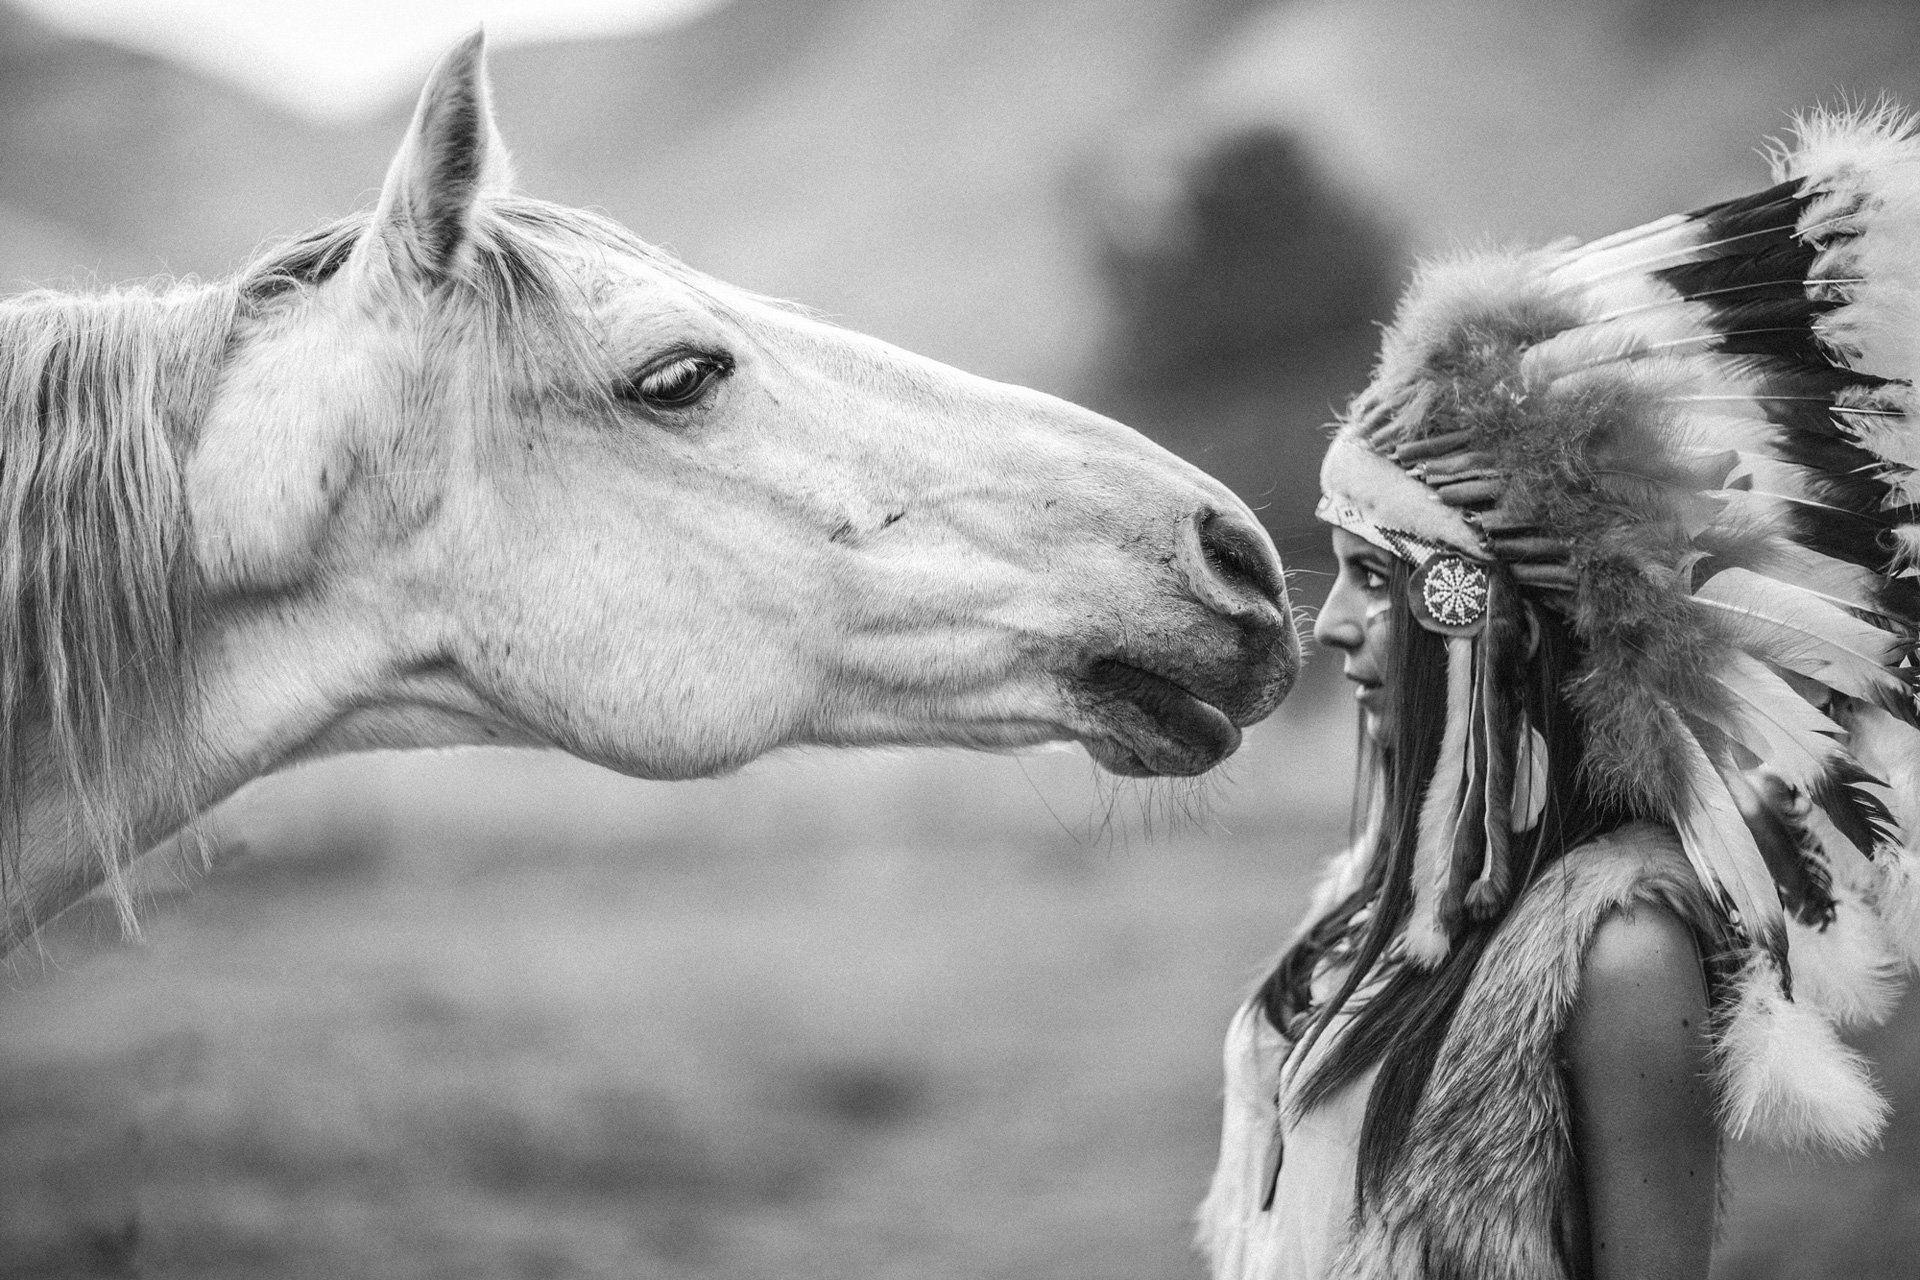 1920x1280 Native American Indian Western Wallpaper Horse And Native American 1920x1280 Download Hd Wallpaper Wallpapertip